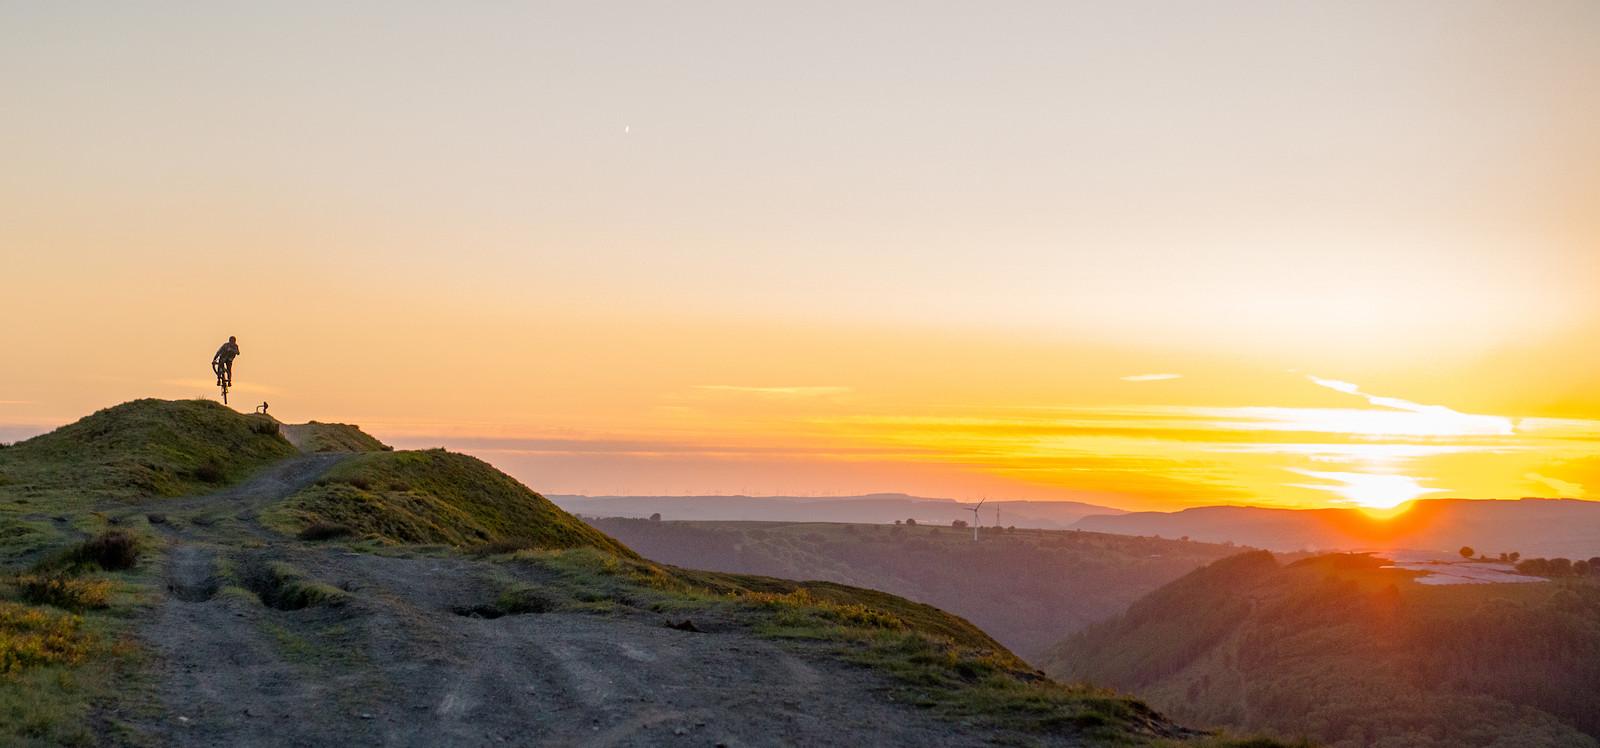 Jack Perry - Matthew Davies - Mountain Biking Pictures - Vital MTB